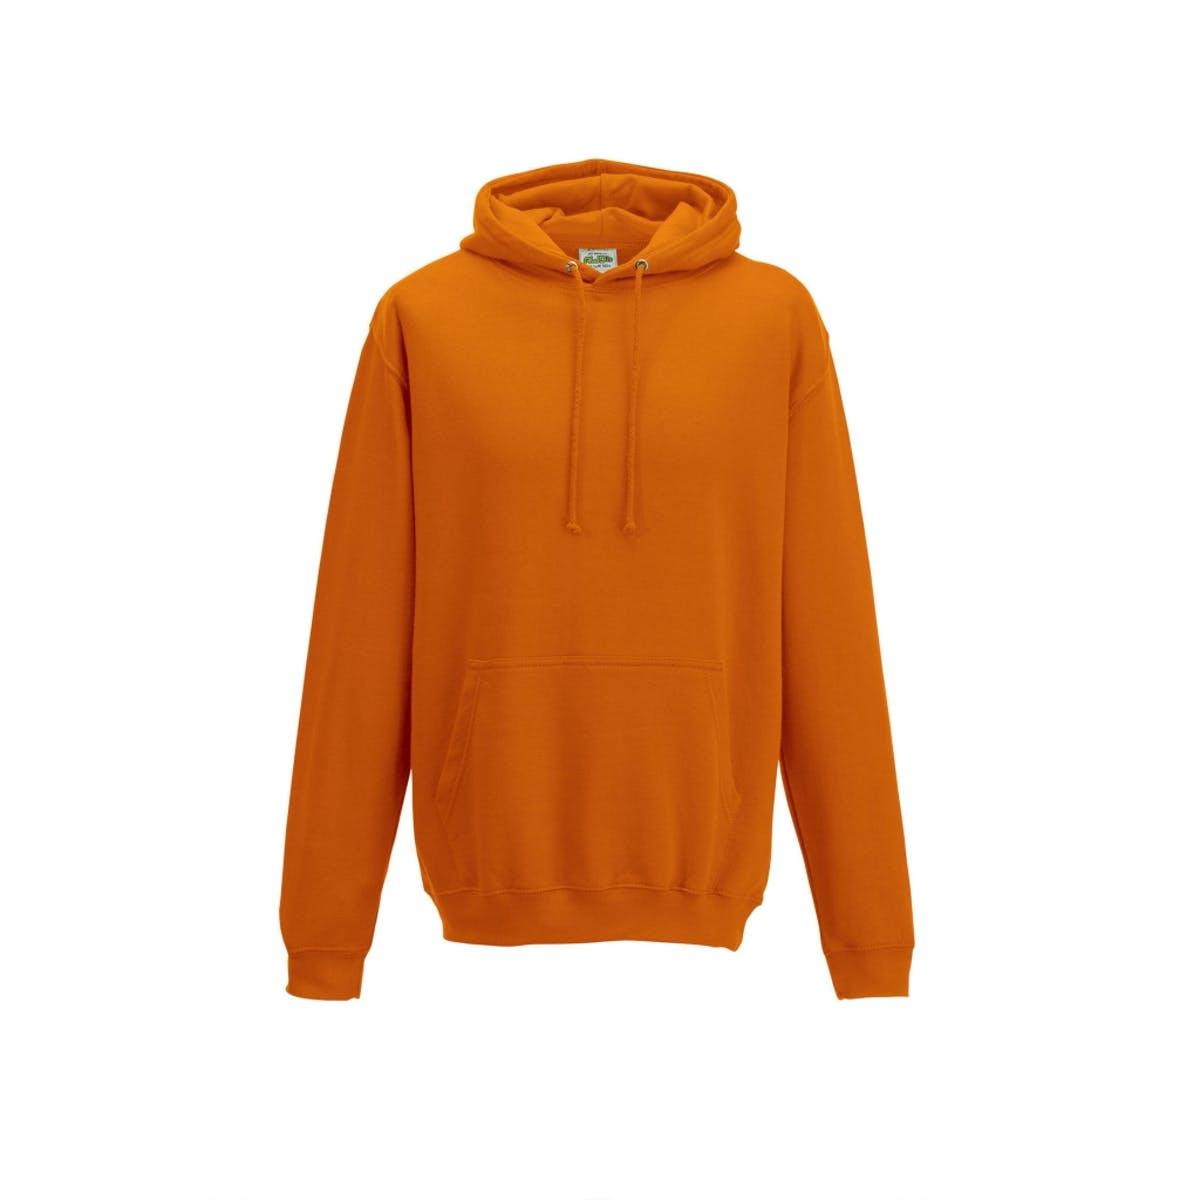 orange crush college hoodies